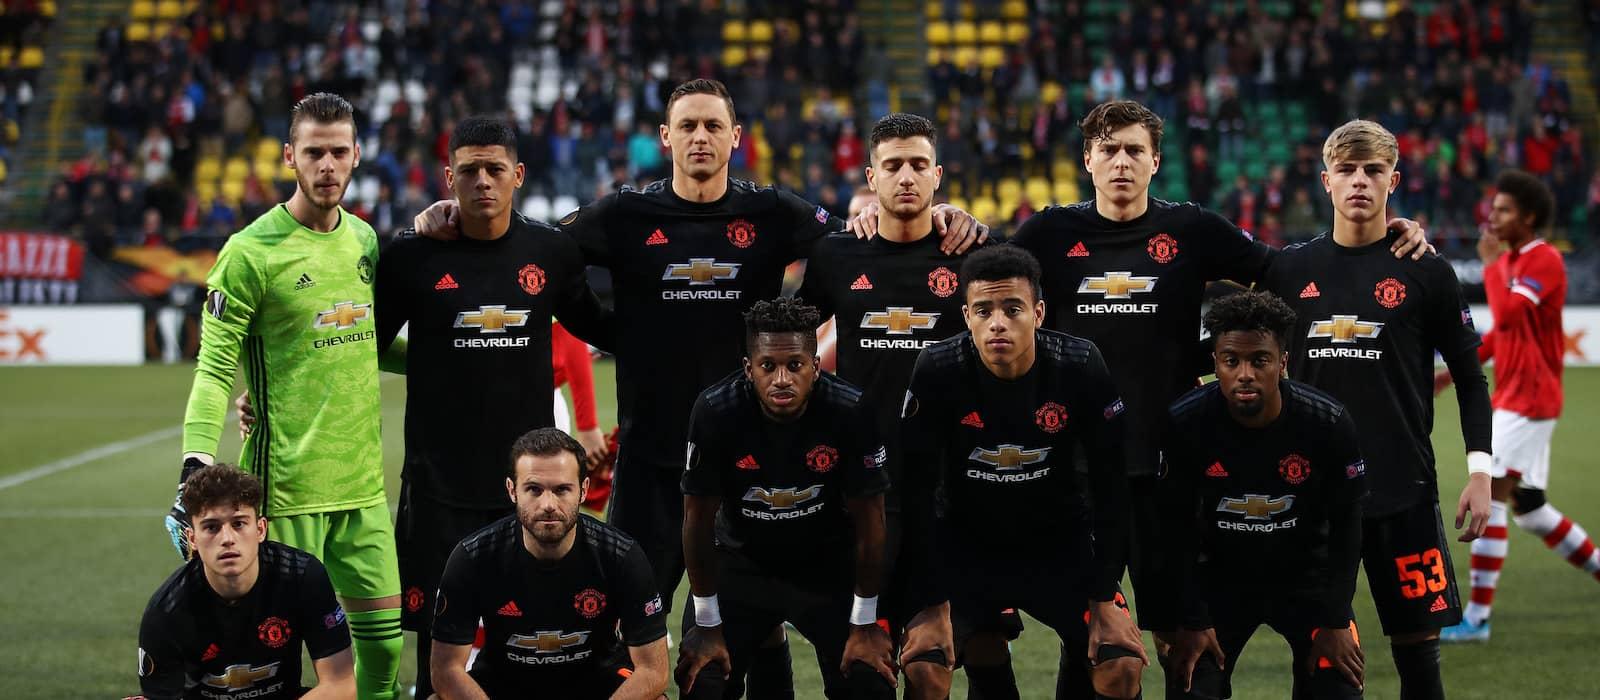 Player ratings: AZ Alkmaar 0-0 Manchester United